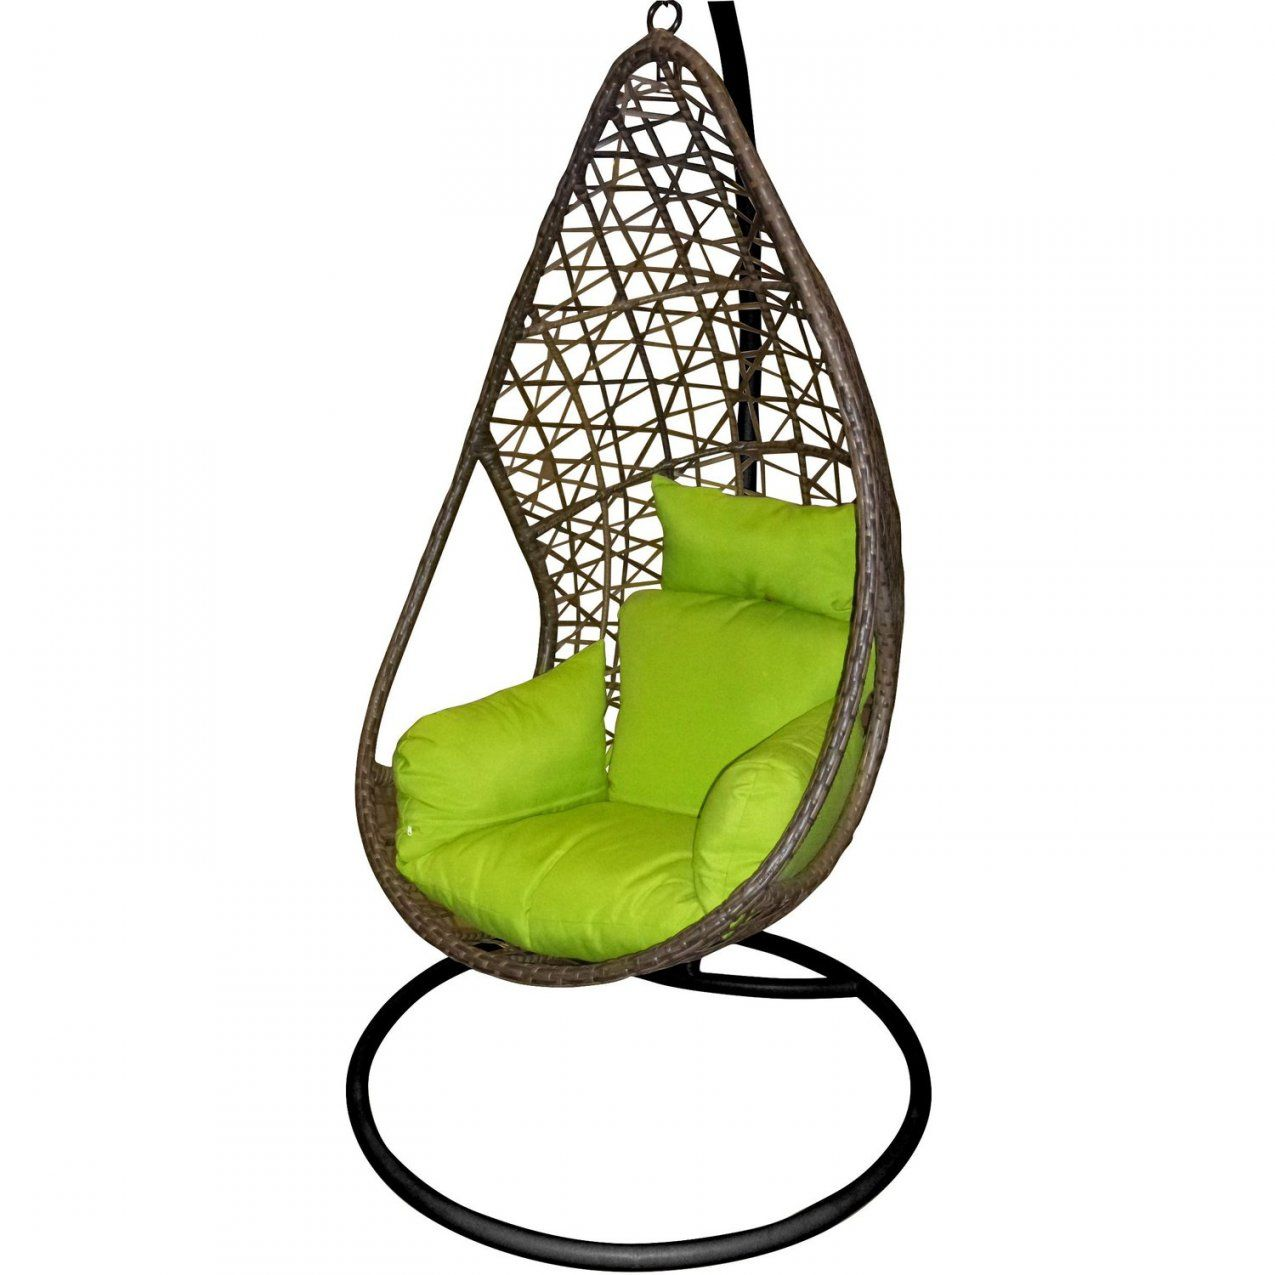 Schaukel Ikea Hangeschaukel Ikea Hangesessel Von Svinga Ekorre Und